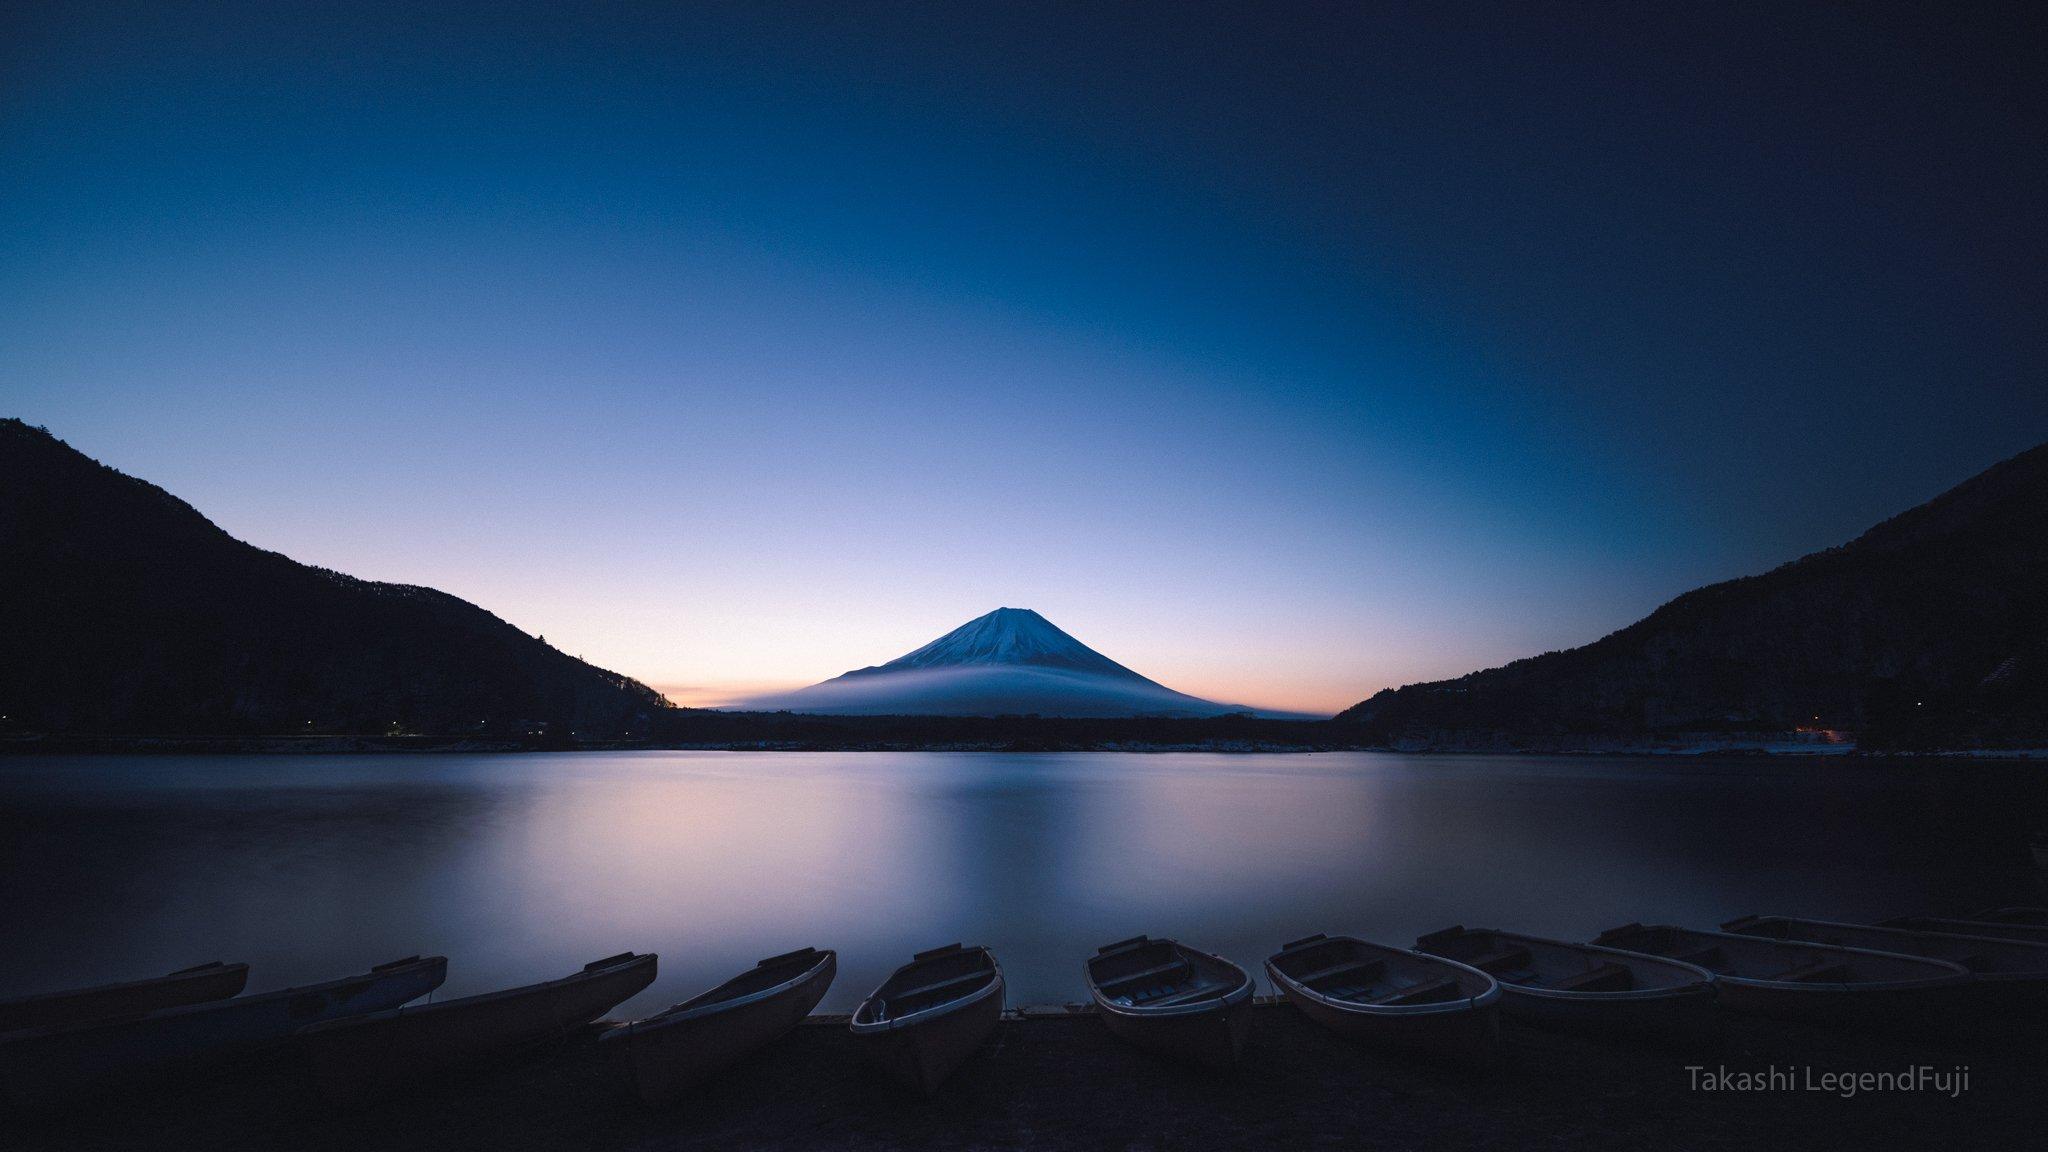 fuji,mountain,Japan,lake,water,dawn,boat,blue,sky,, Takashi